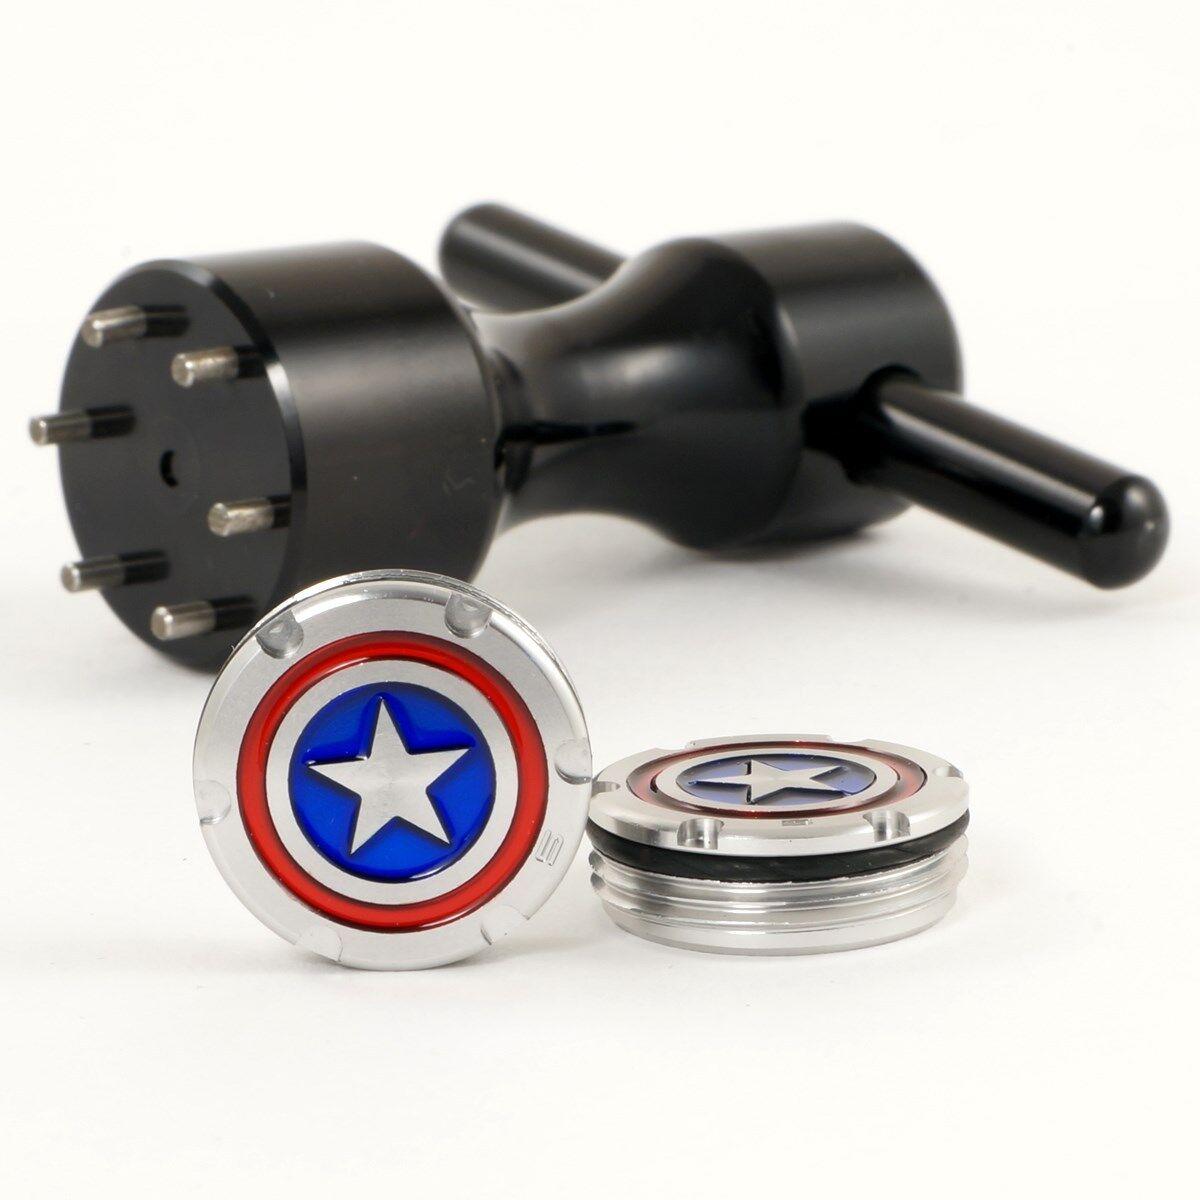 2 X 5g Tour estilo  Pesos + Llave Para scotty cameron Putters, Capitán América  suministro directo de los fabricantes